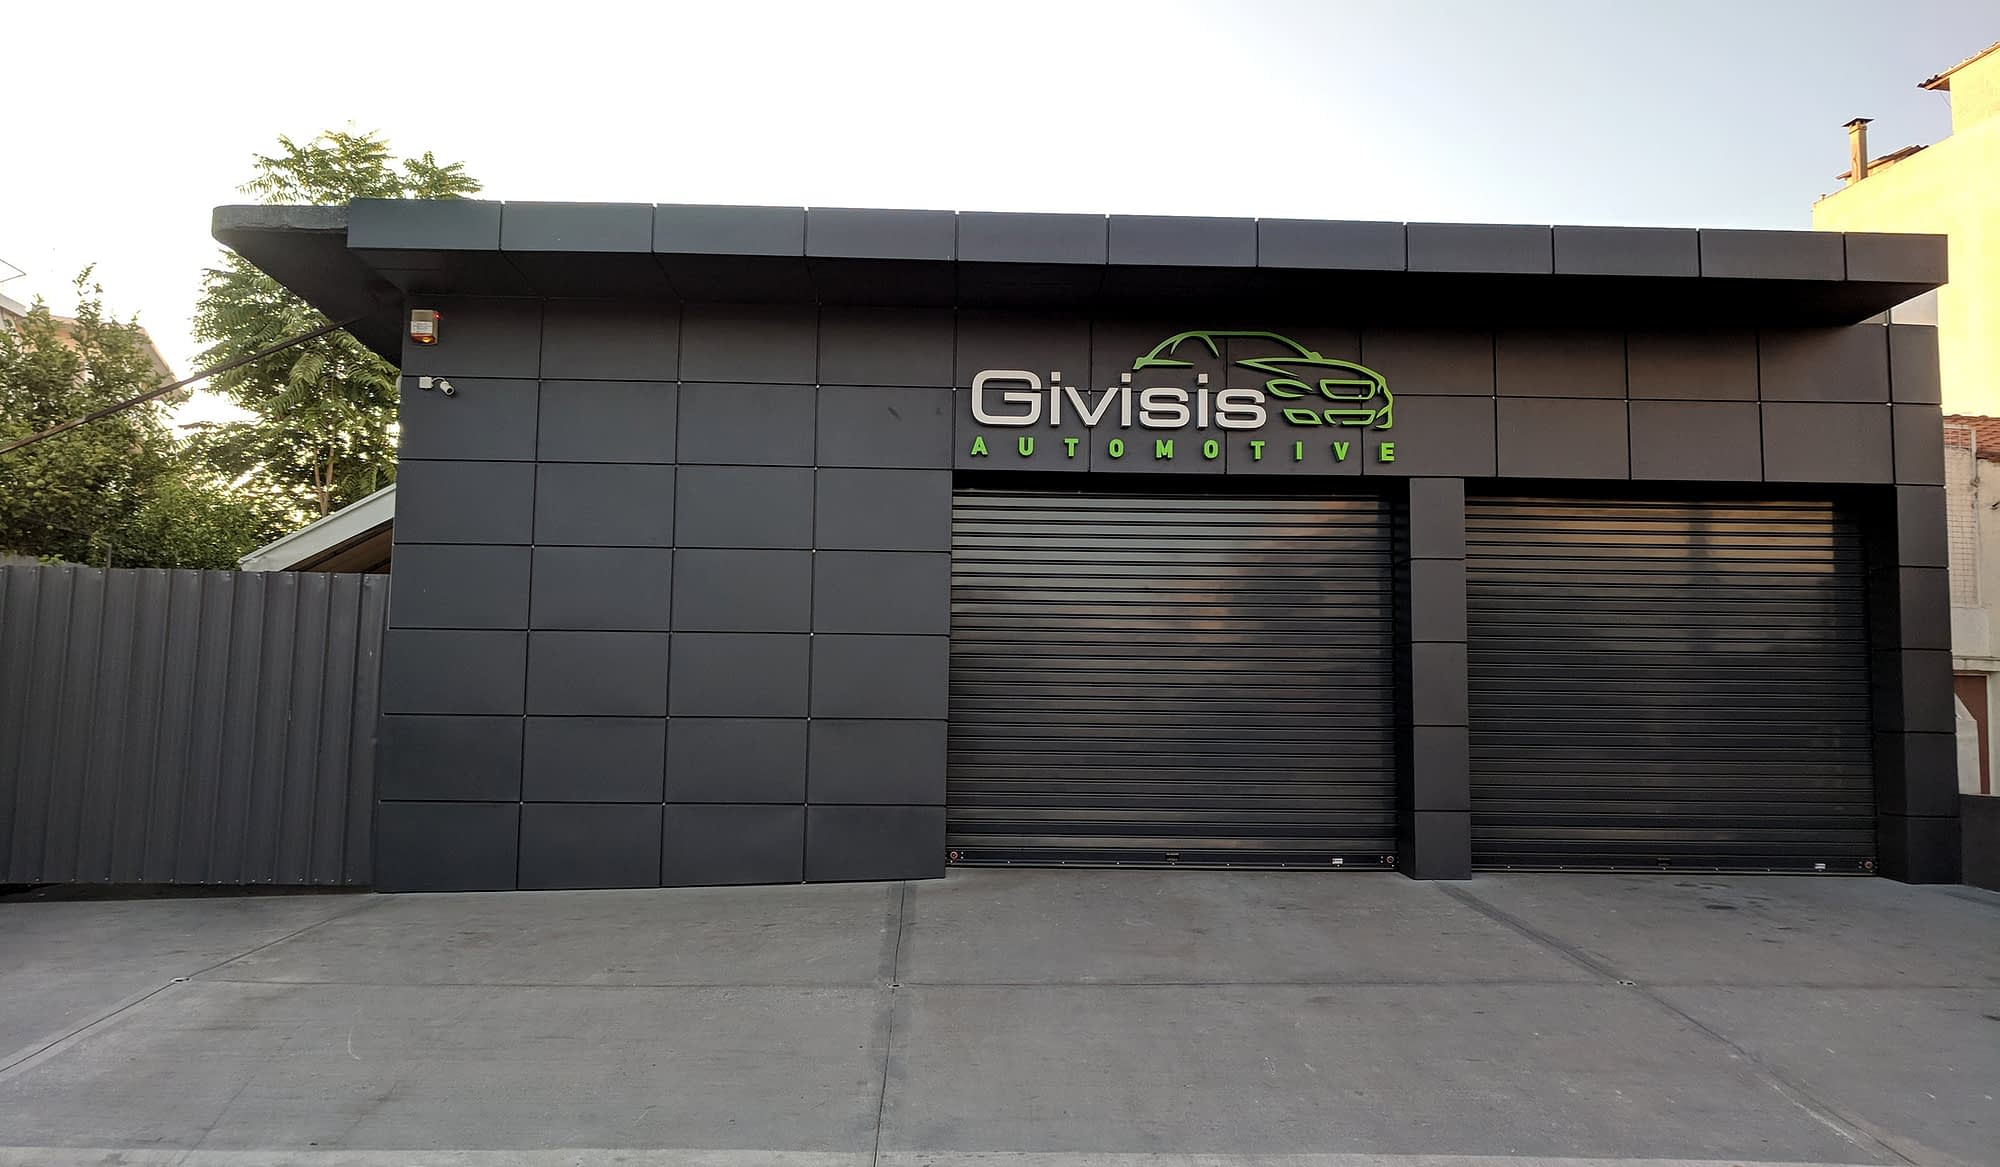 Givisis συνεργείο αυτοκινήτων